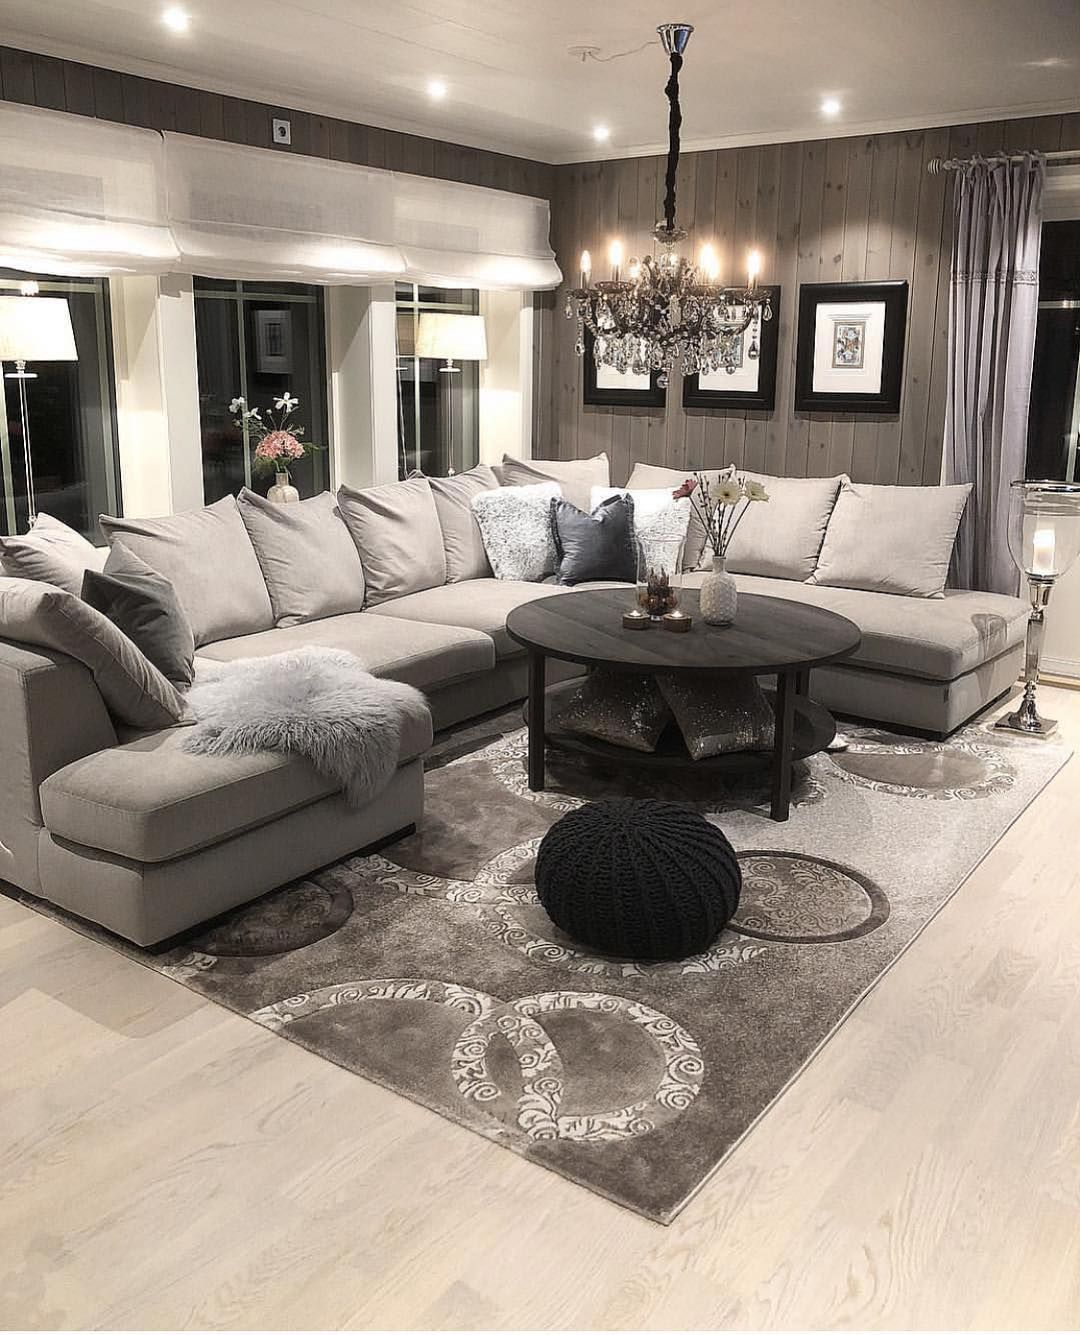 Marvelous 22 Beegcom Best Interior Design Schools In India Trendy Living Rooms Living Room Ideas 2019 Living Room White